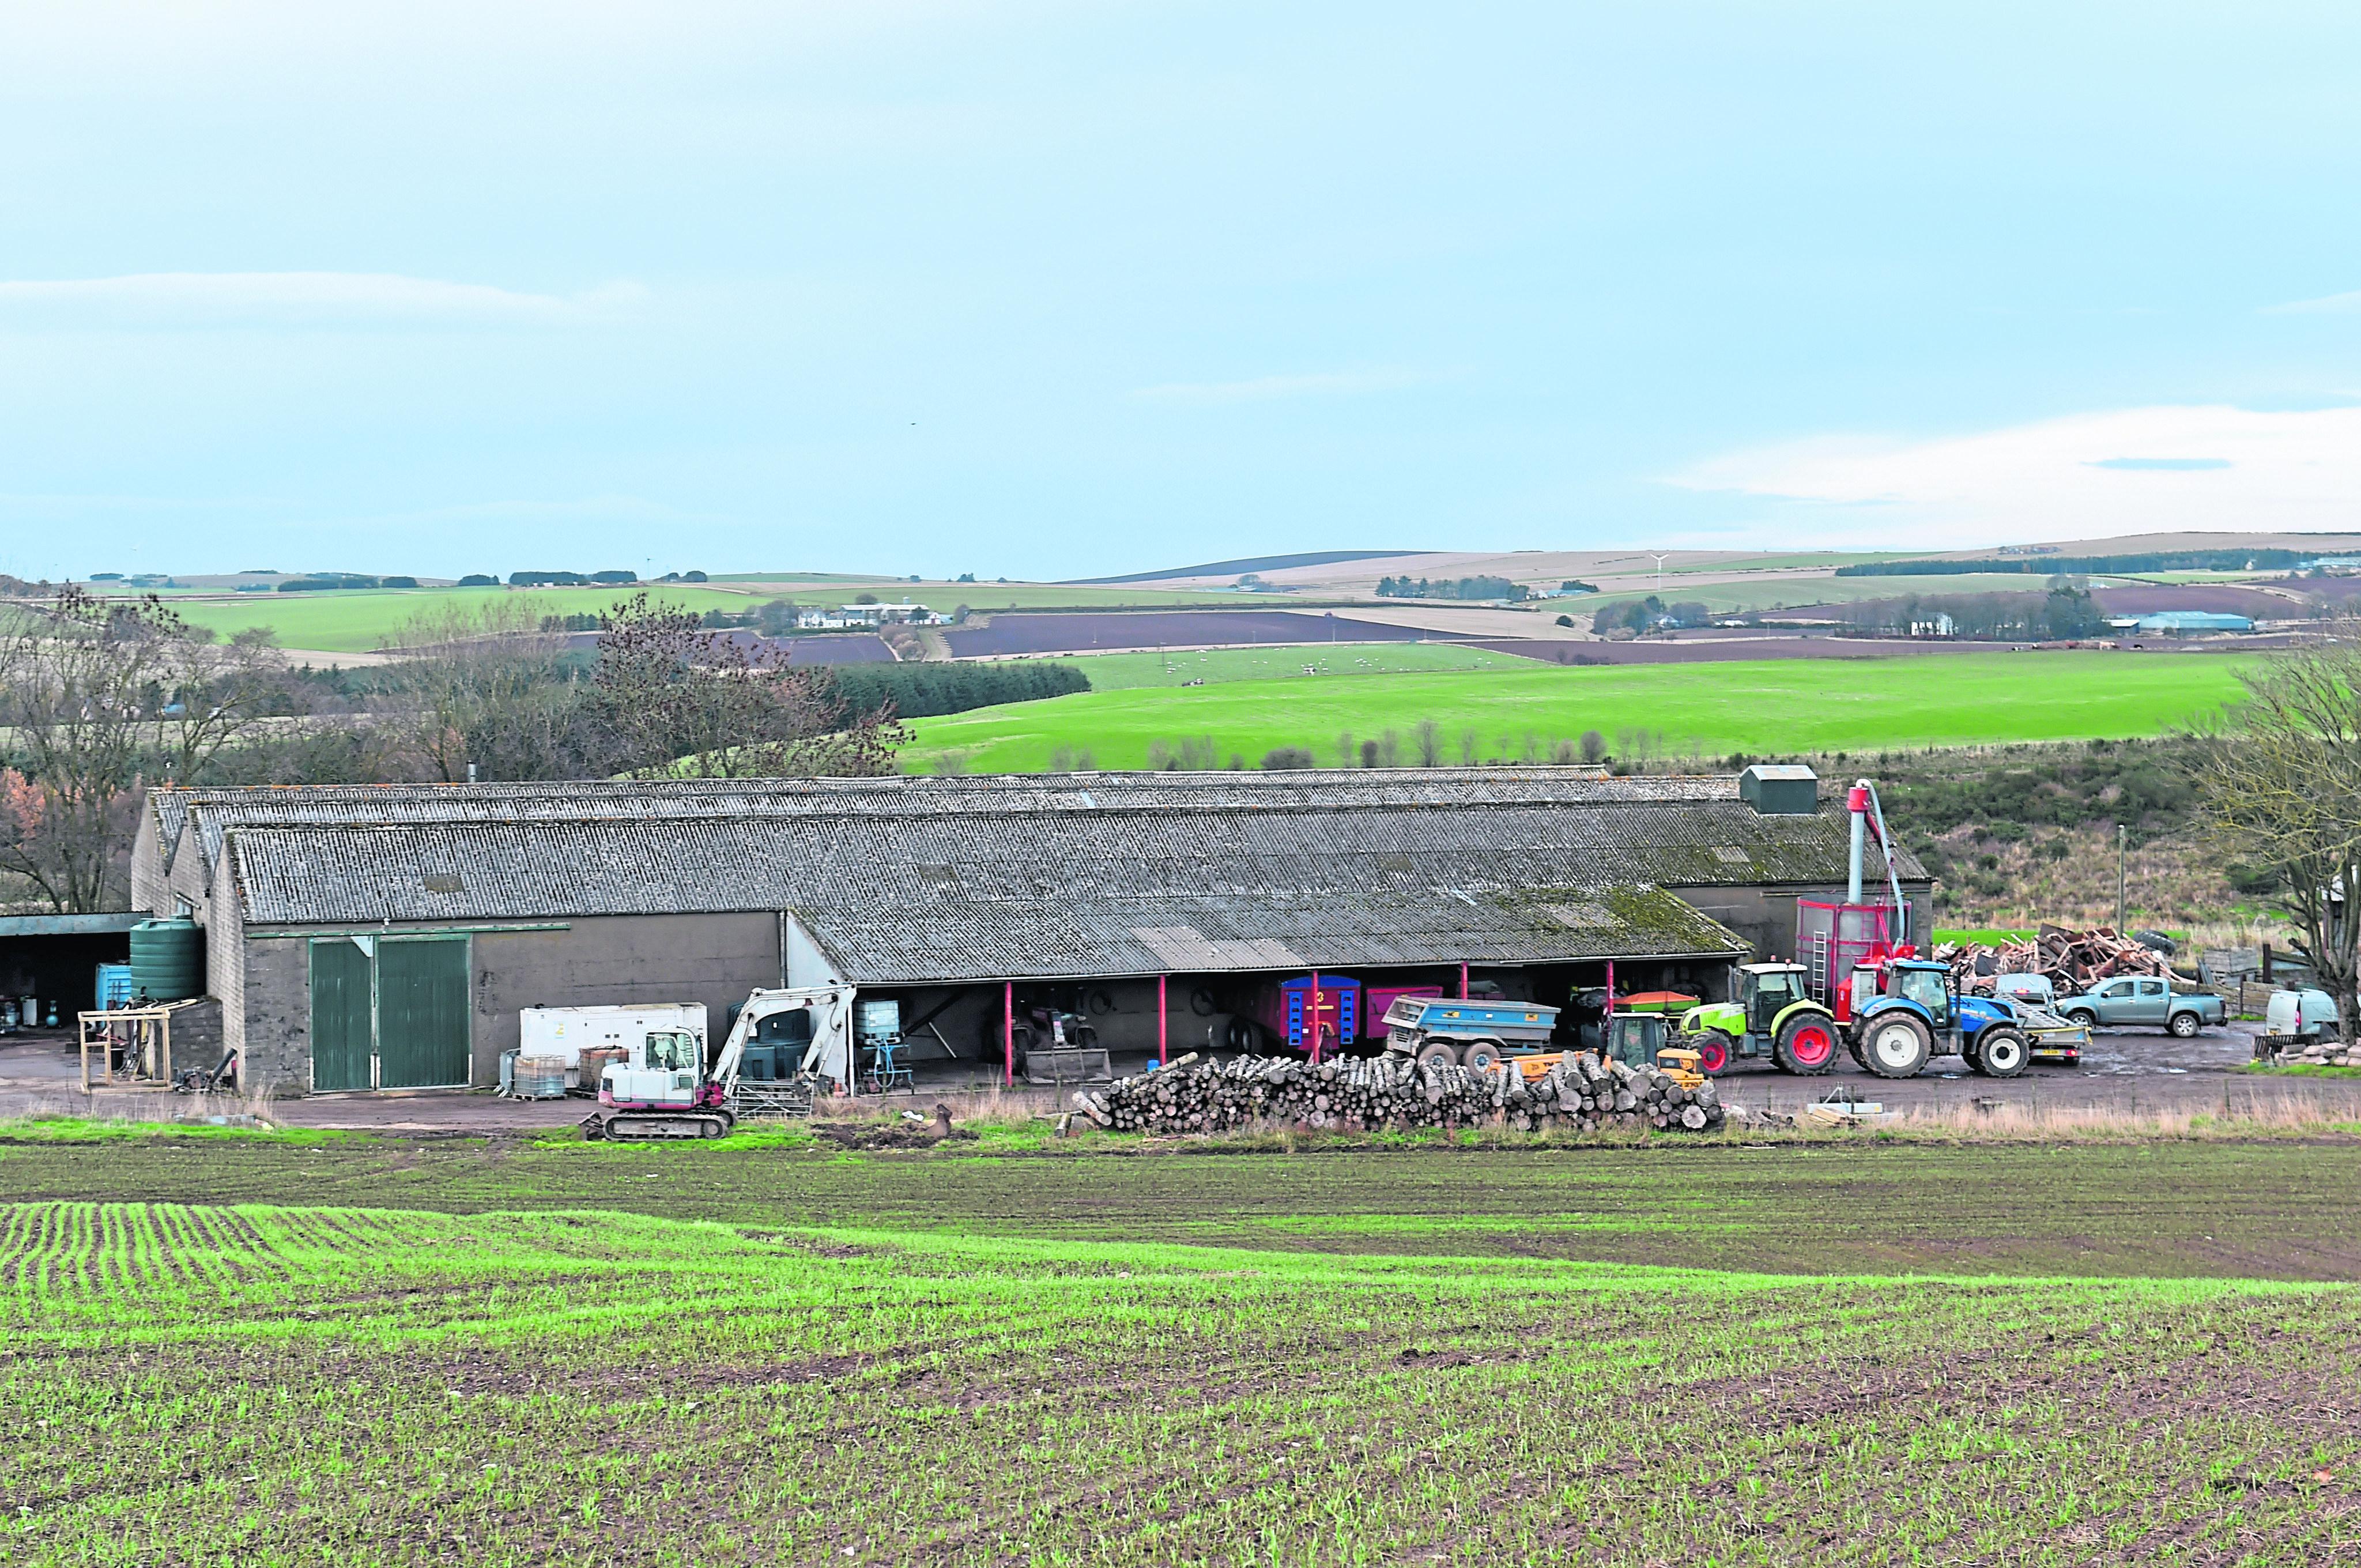 47-year-old Neil Ironside died in an incident at Auchlinn Farm near Turriff.